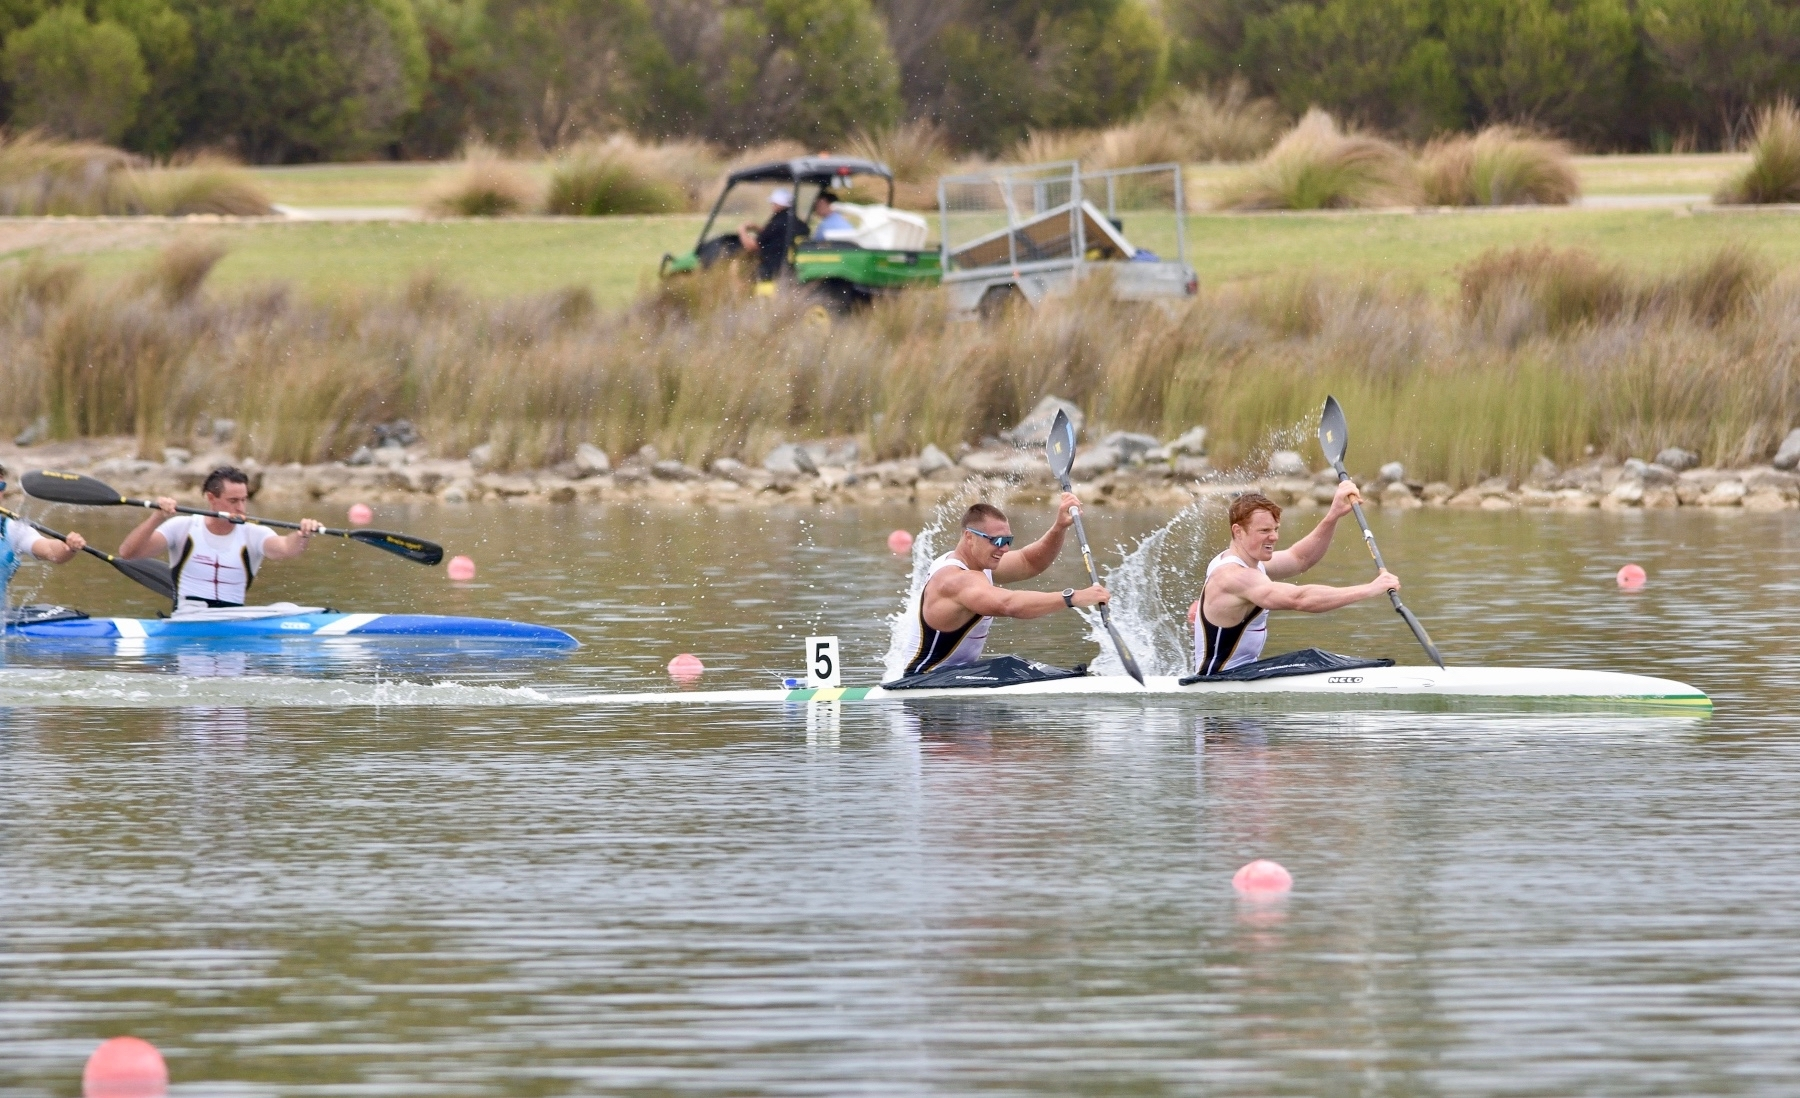 National Canoe Day 2019